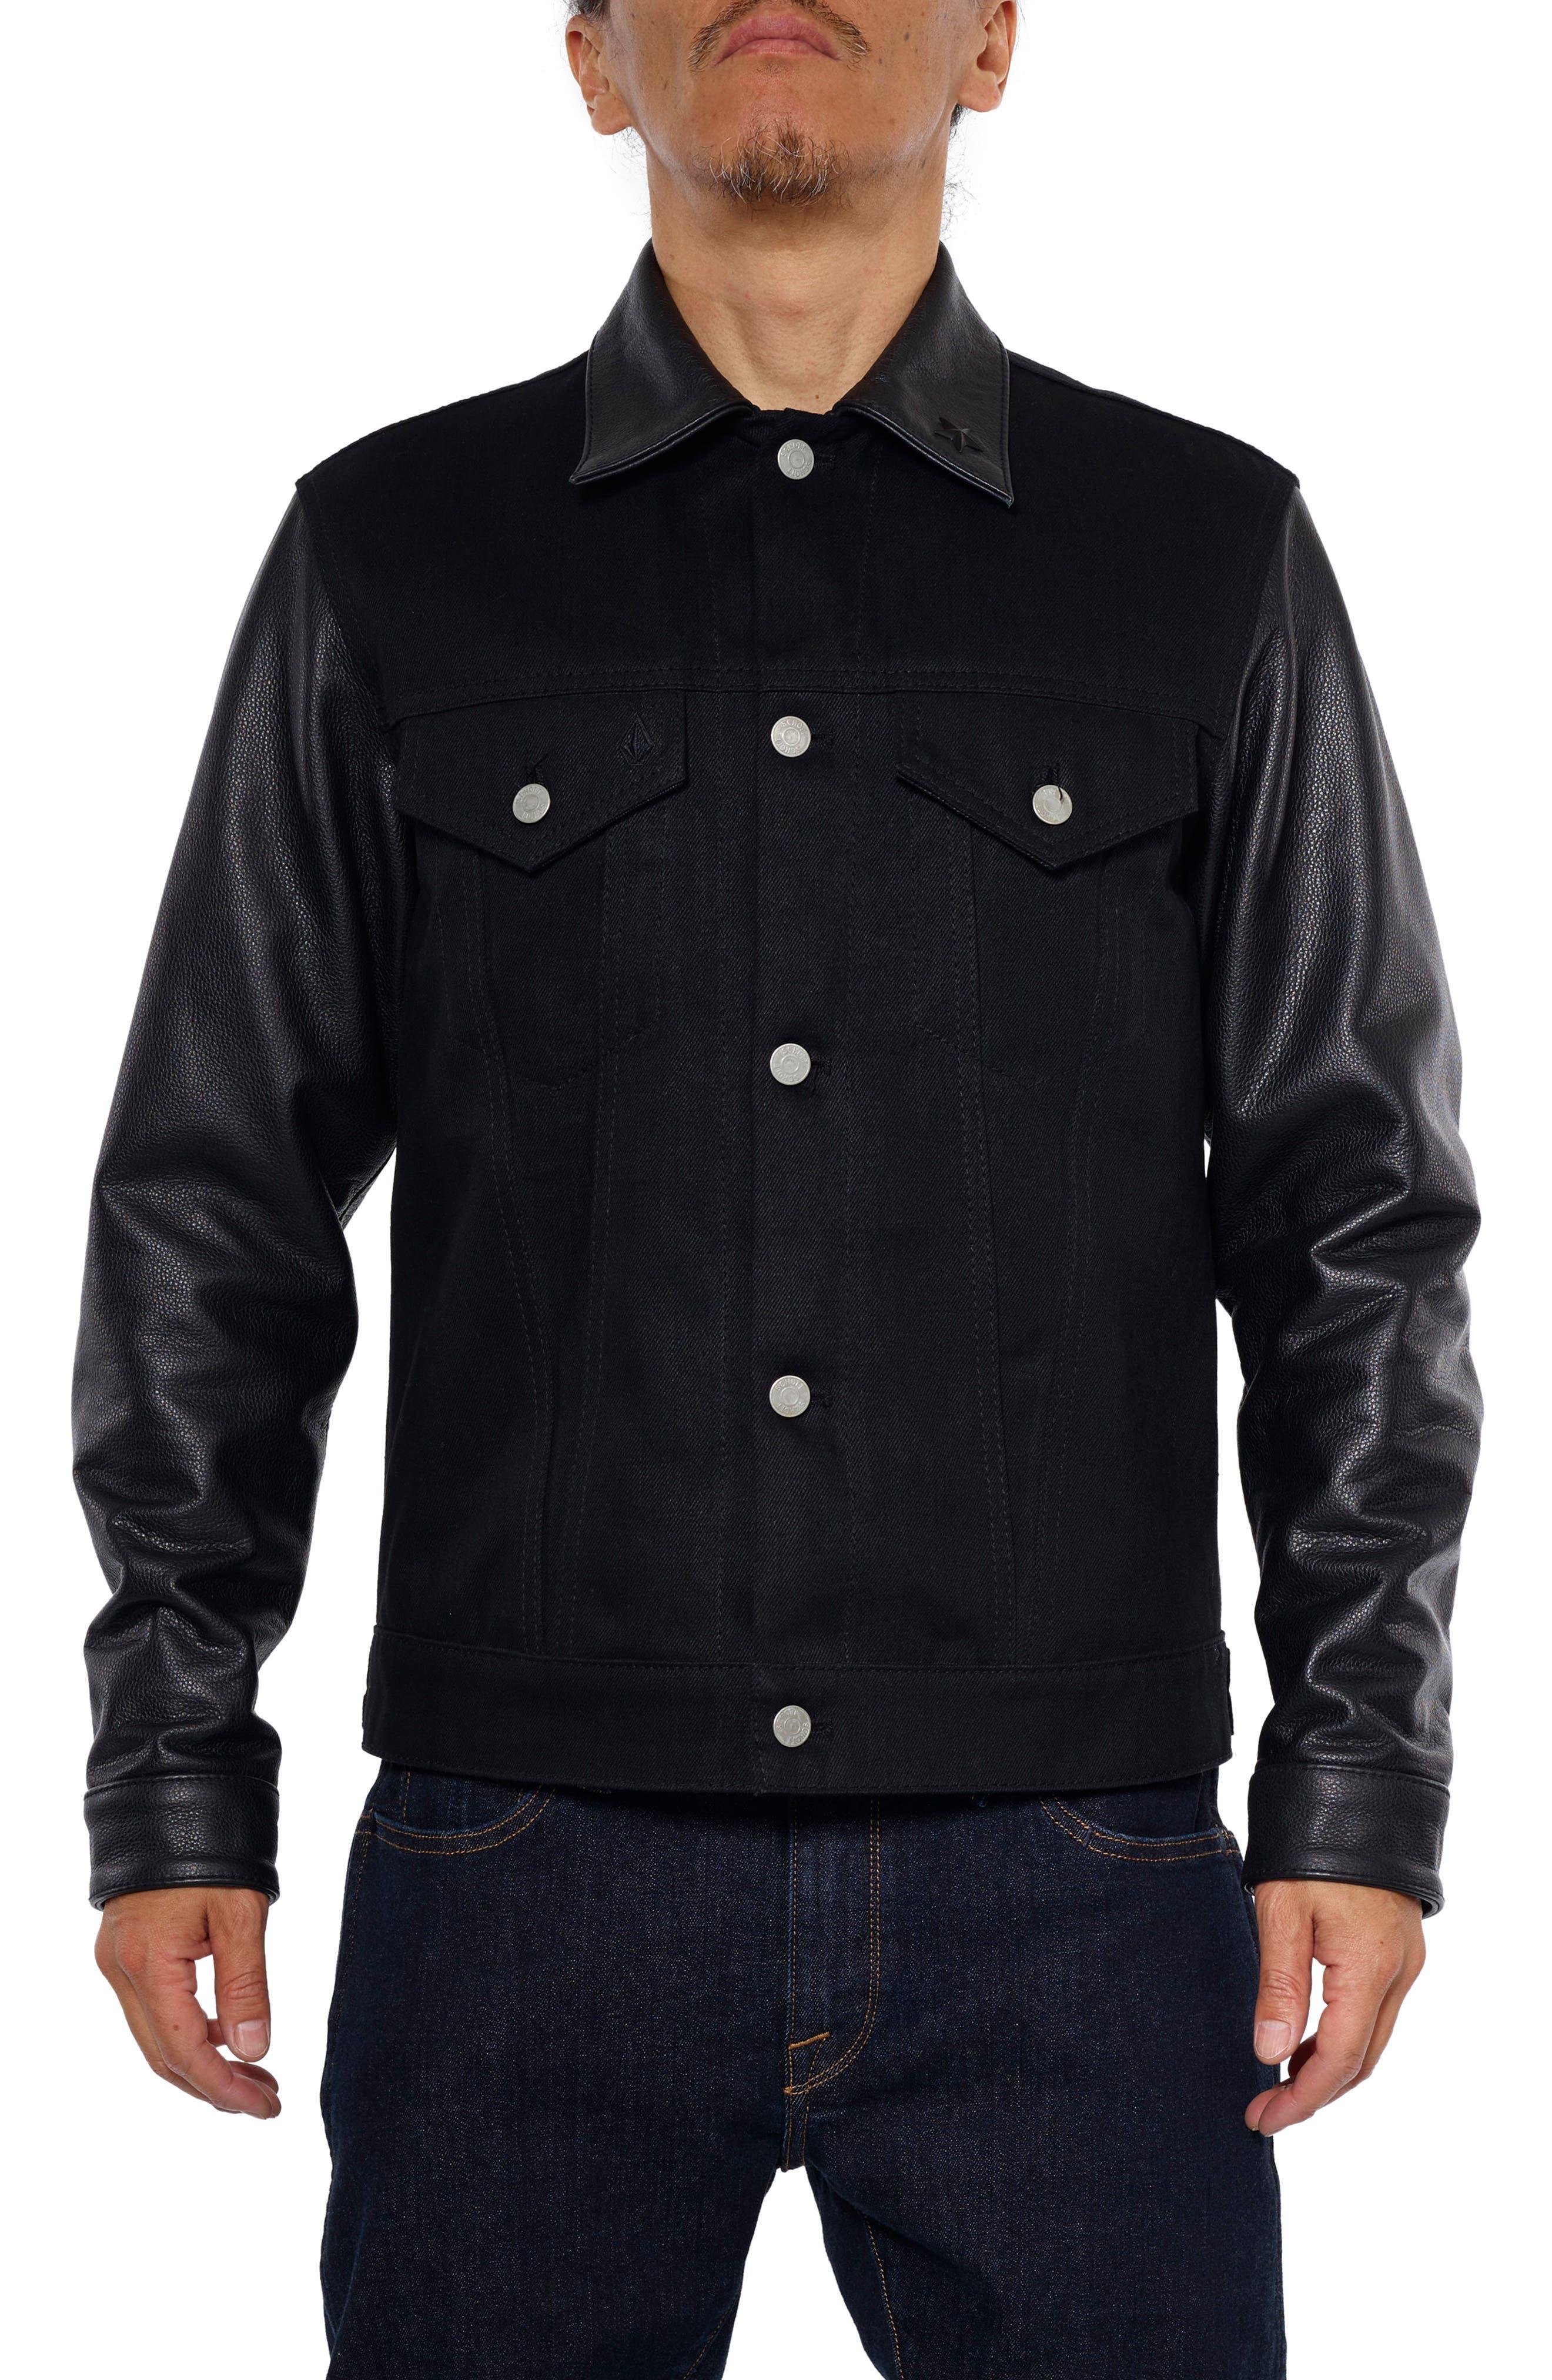 x Schott Denim Jacket,                             Main thumbnail 1, color,                             Black